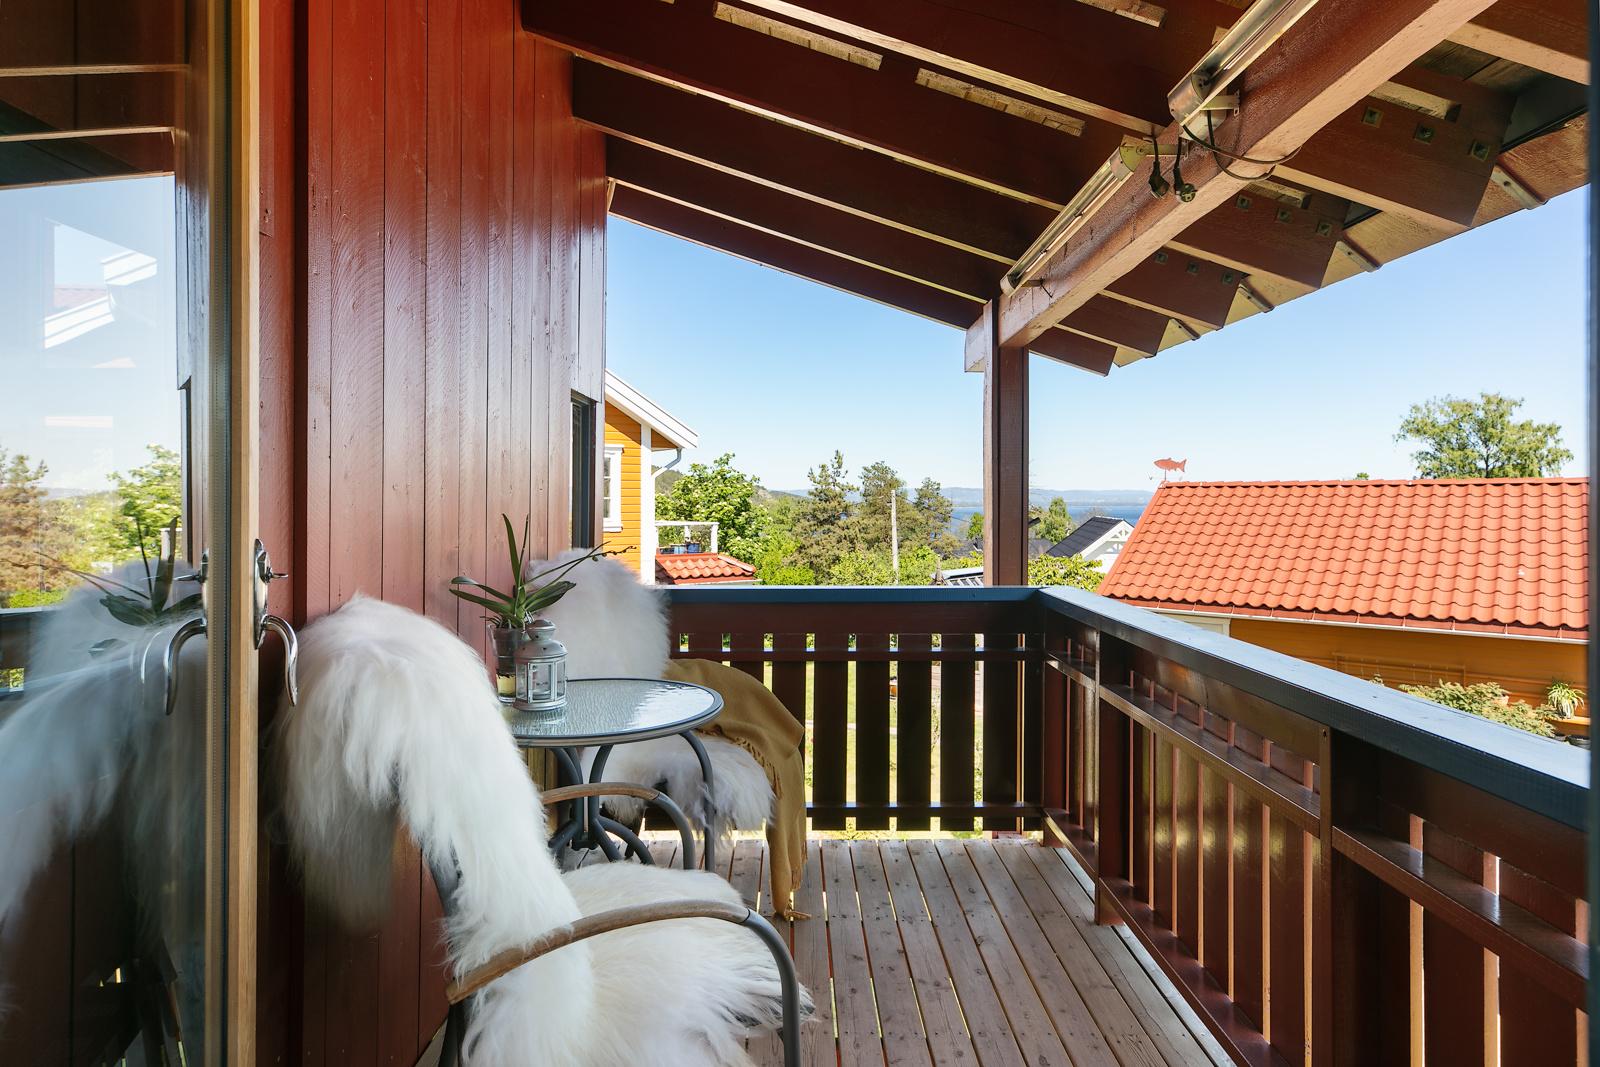 Balkong utenfor stue